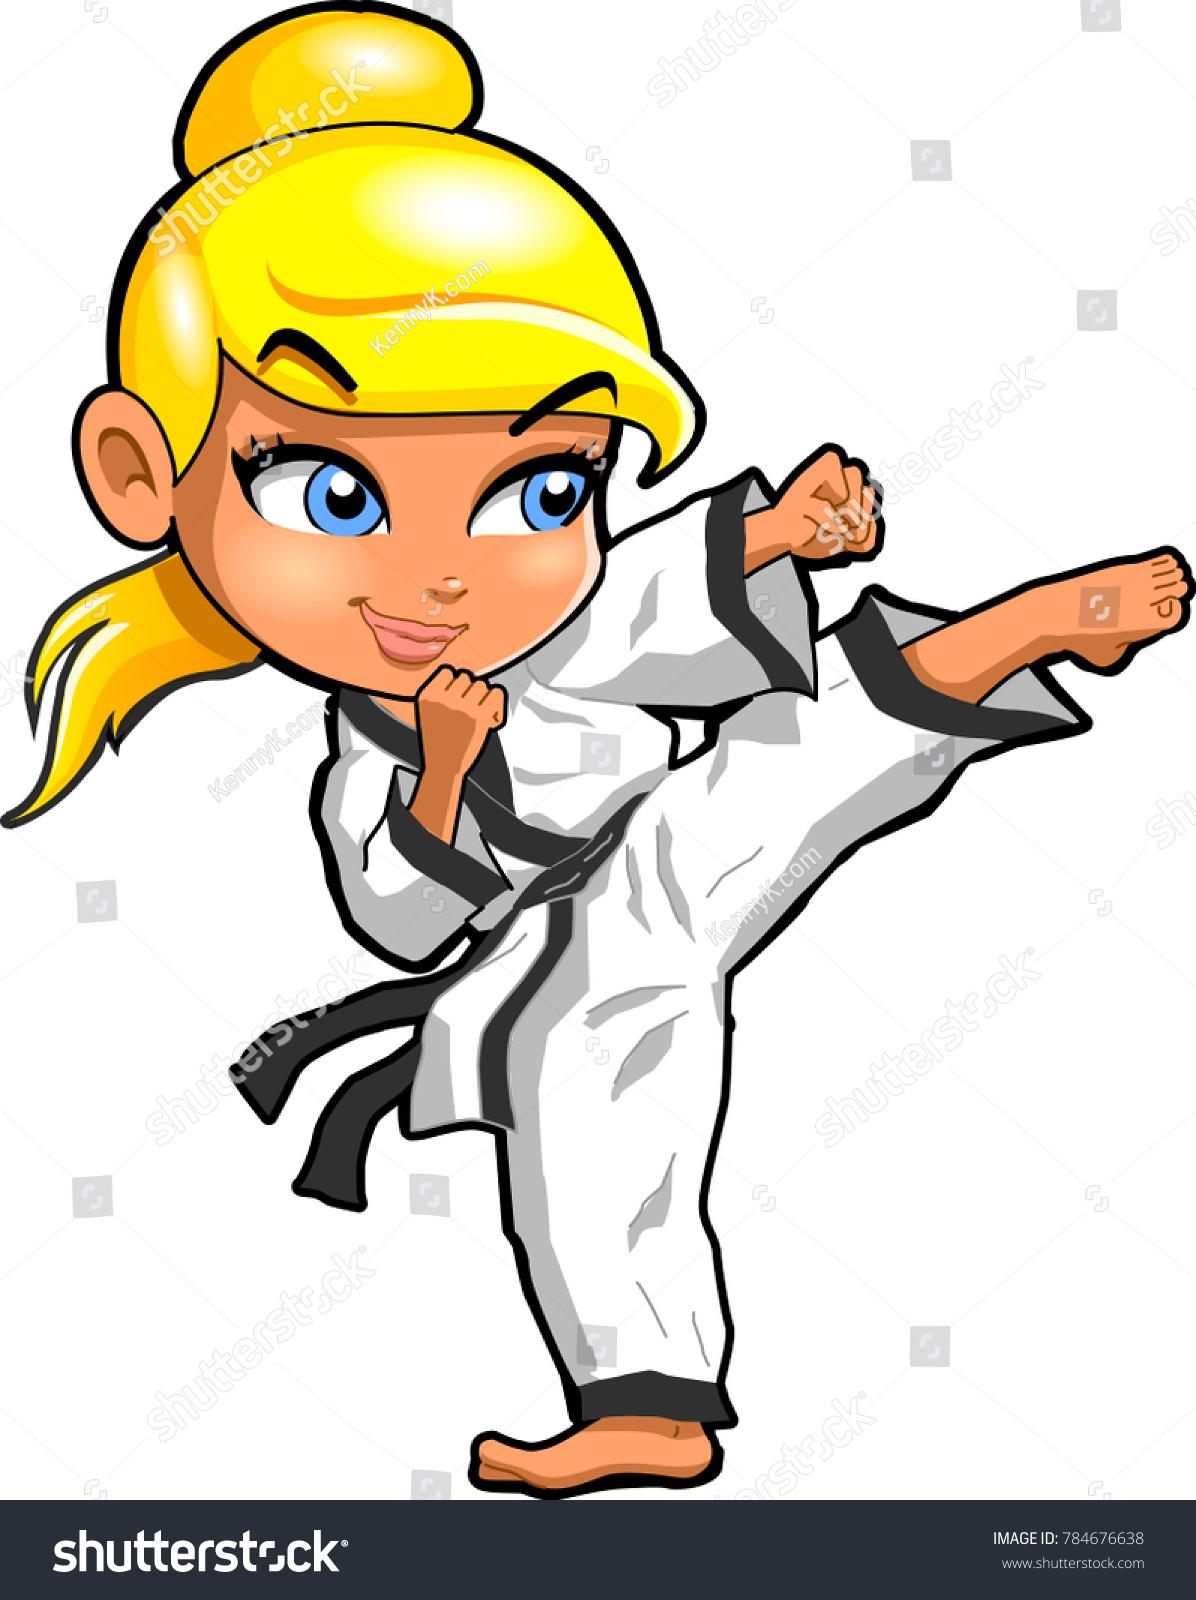 Karate Martial Arts Tae Kwon Do Stock Vector Royalty Free 784676638